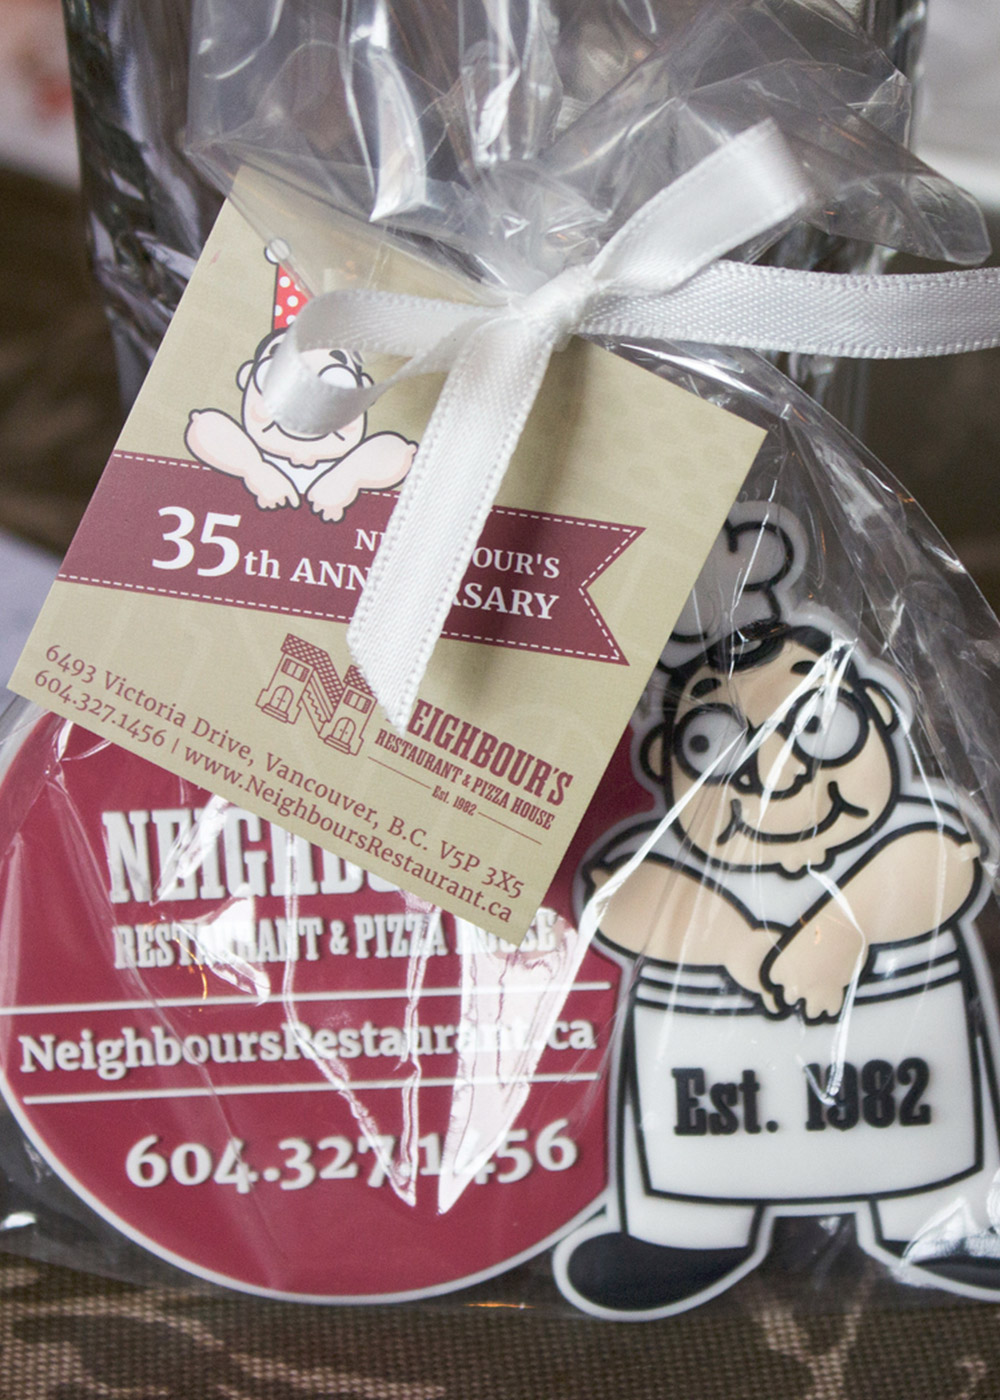 neighbours-restaurant-35th-anniversary-31.jpg